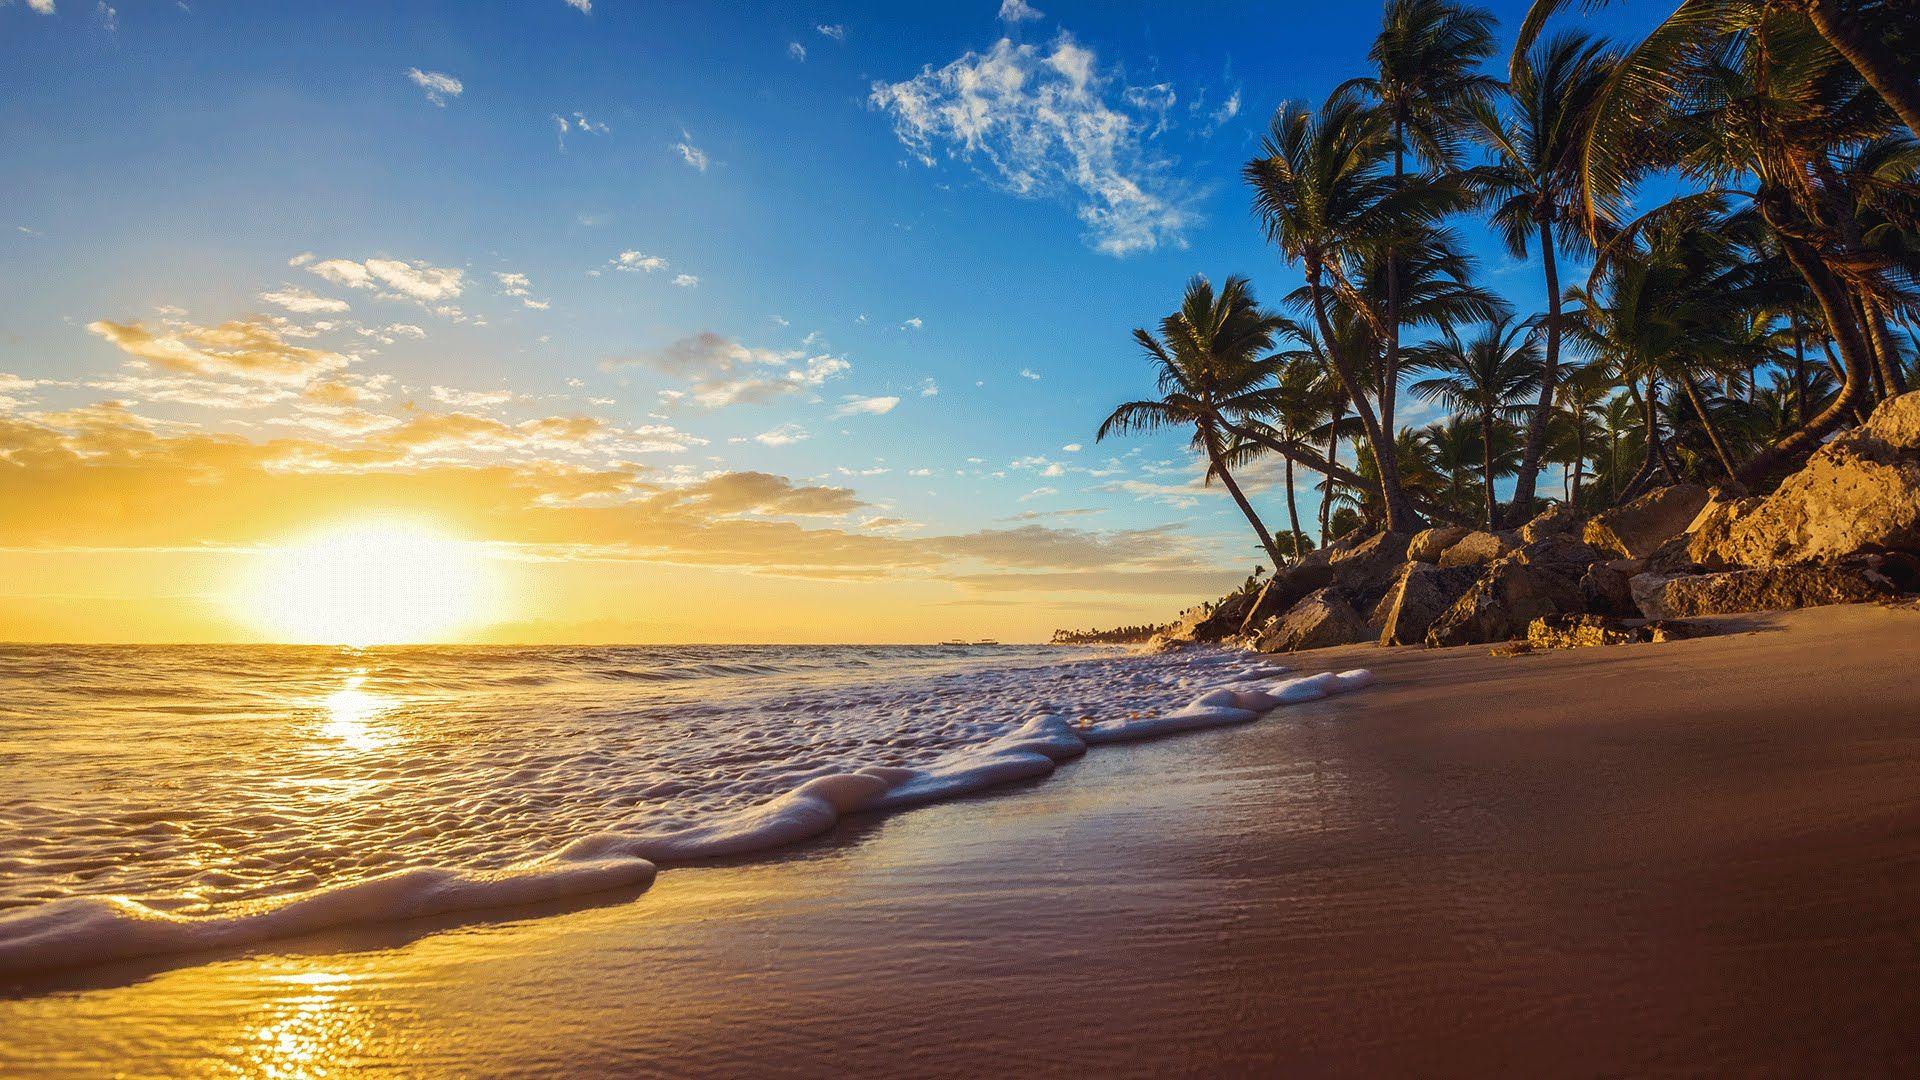 Calm Background Relaxing Music With Ocean And Bird Sounds Tropical Island Beach Sunrise Beach Island Beach